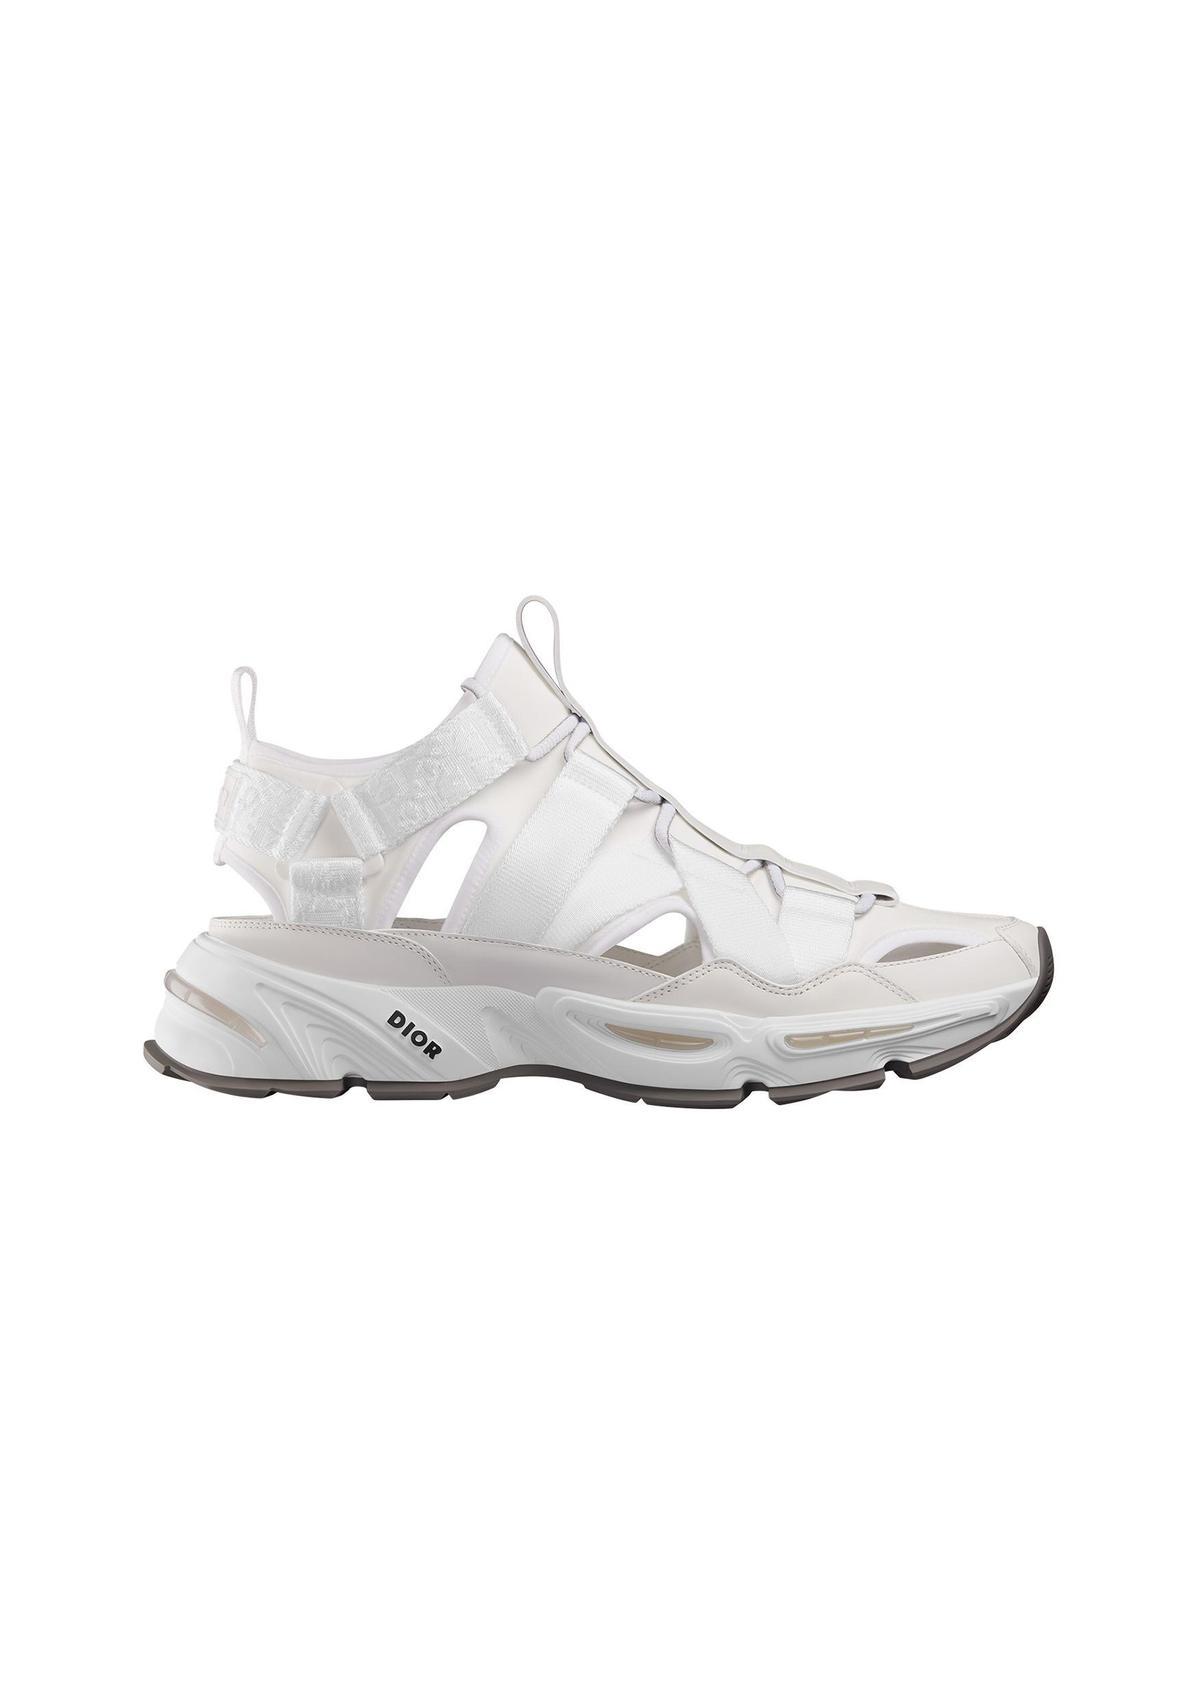 CD1白色潛水布及尼龍涼鞋。NT$30,000。(Dior提供)